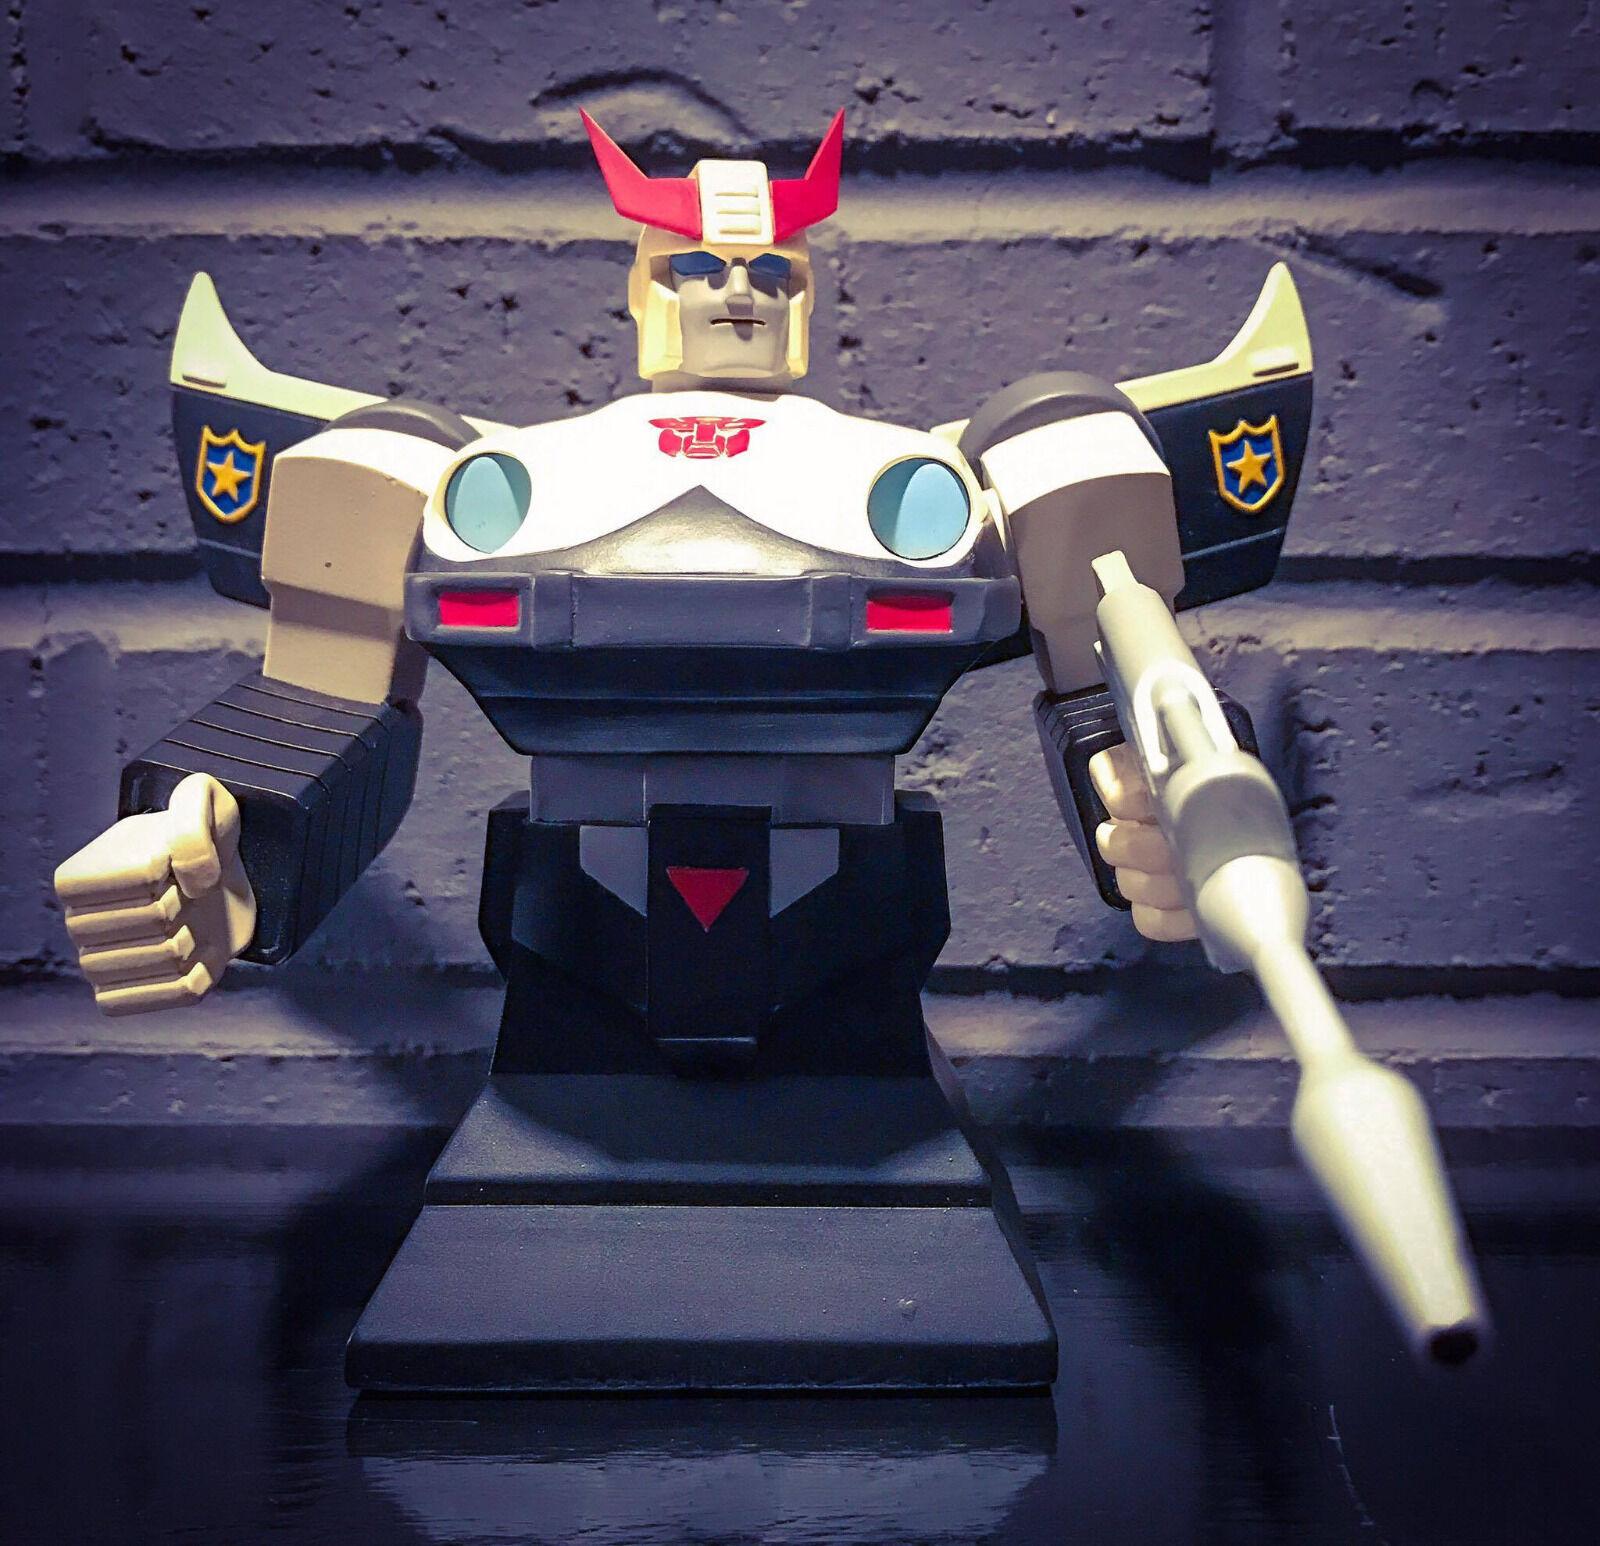 Hasbro 2002 G1 Transformers Prowl Cold Cast Porcelain Bust Hard Hero 0912/5000